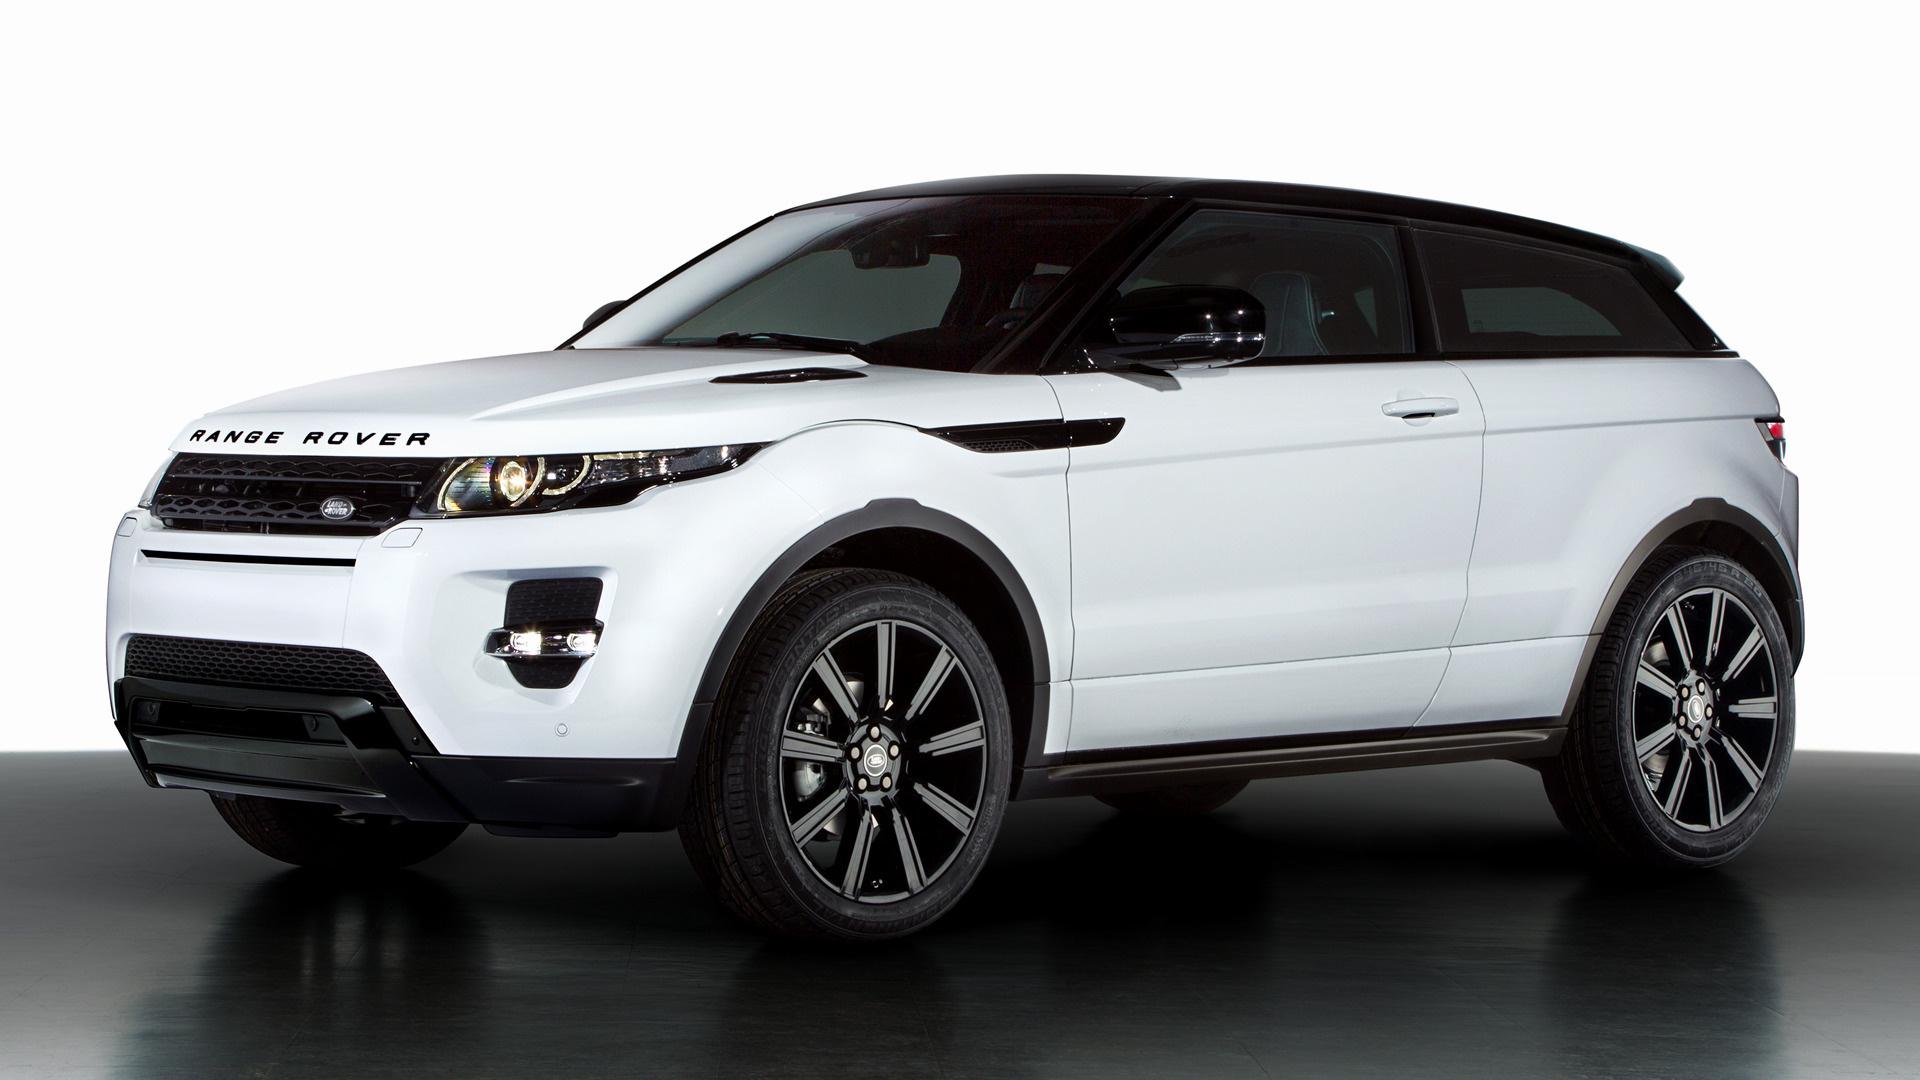 range rover evoque coupe dynamic black design pack 2013 wallpapers and hd images car pixel. Black Bedroom Furniture Sets. Home Design Ideas